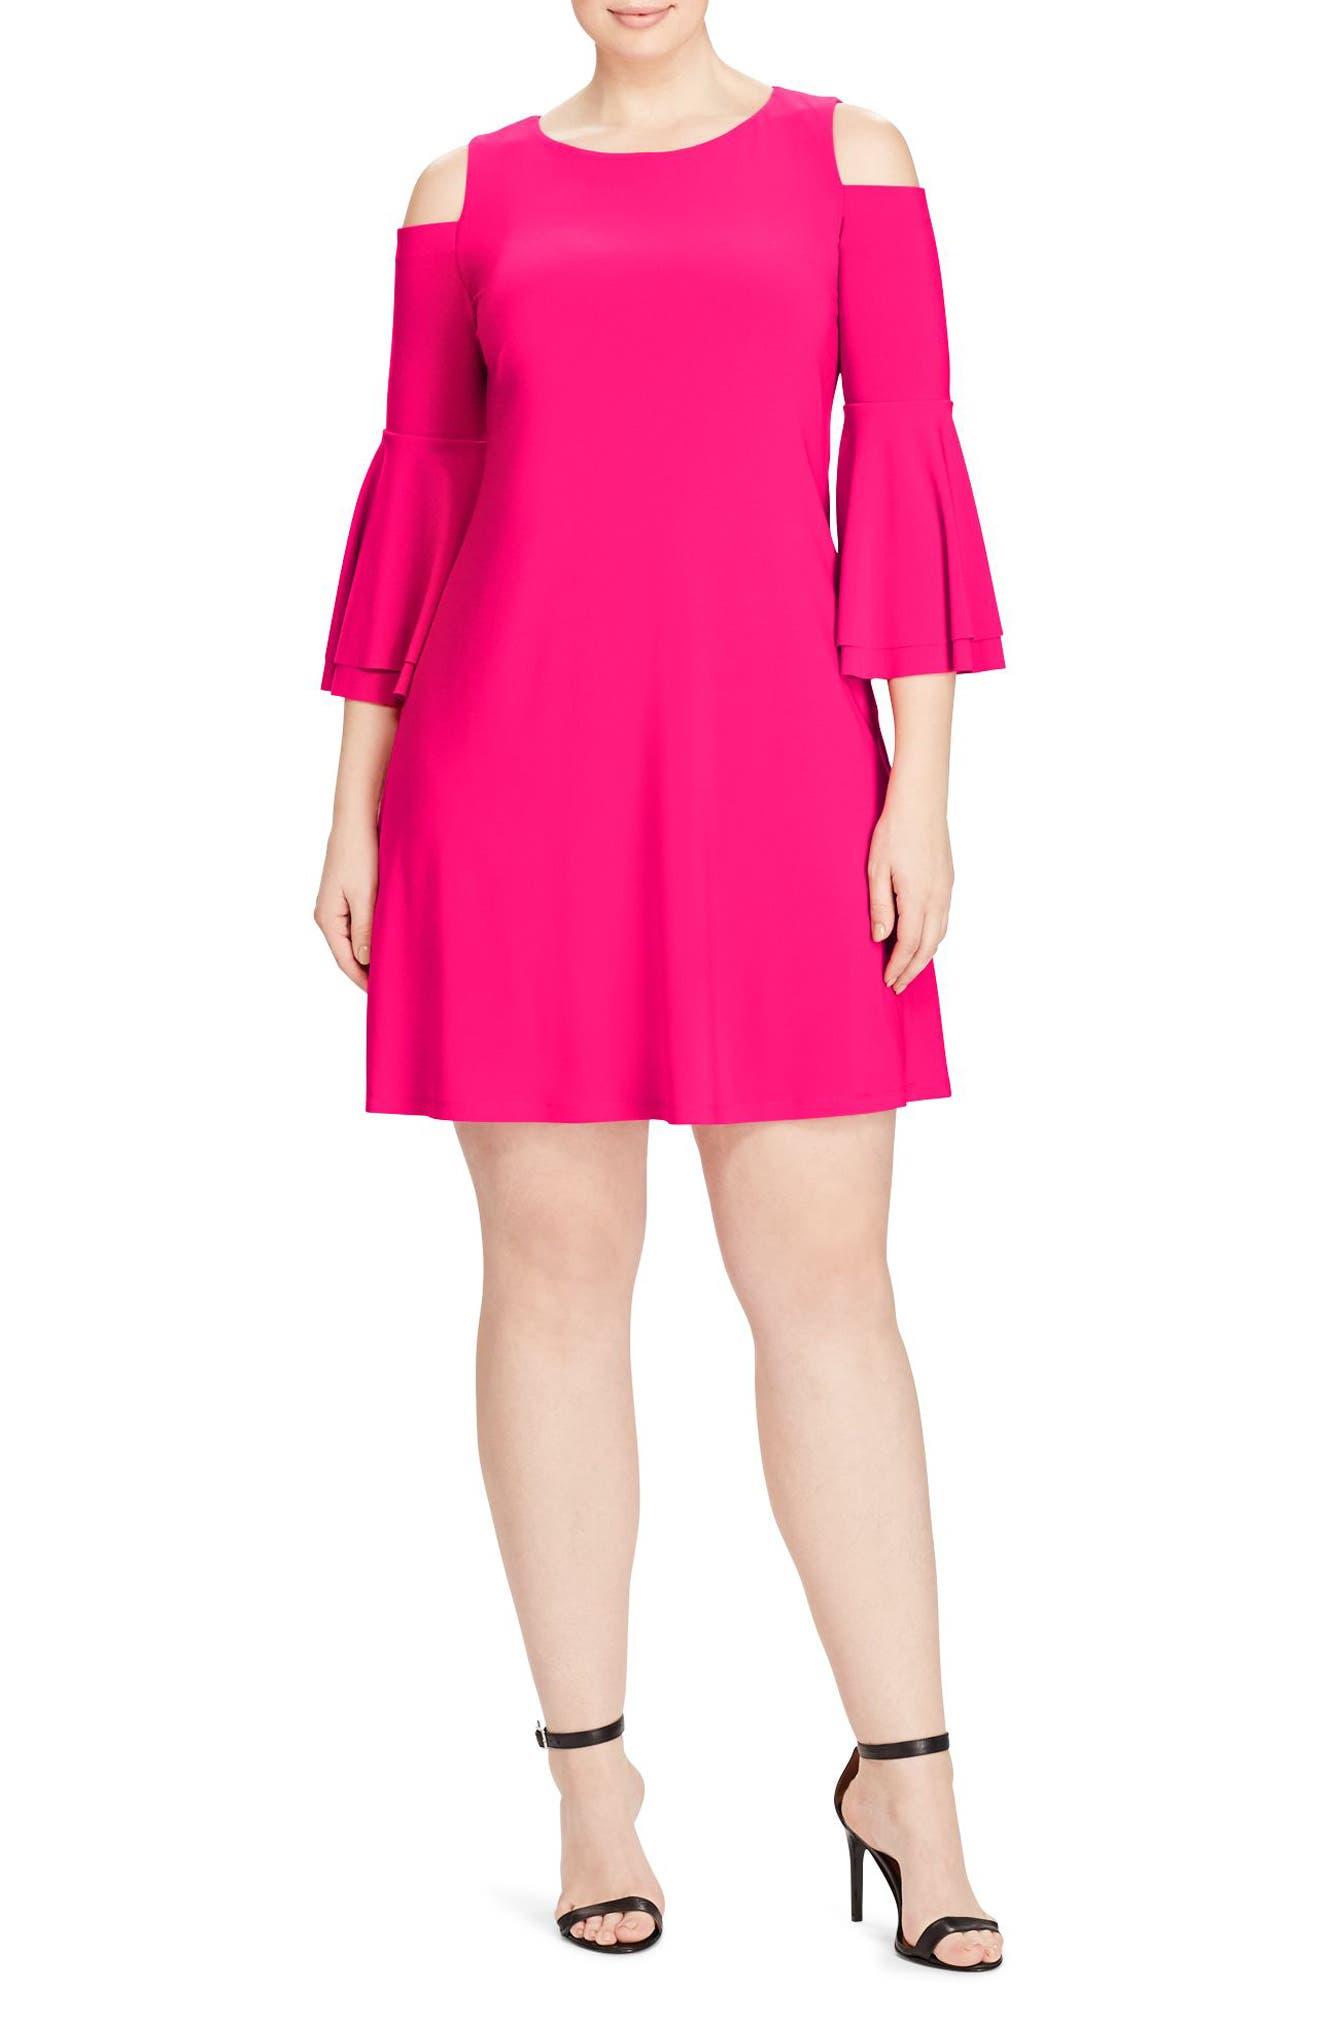 Alternate Image 1 Selected - Lauren Ralph Lauren Cold Shoulder A-Line Dress (Plus Size)